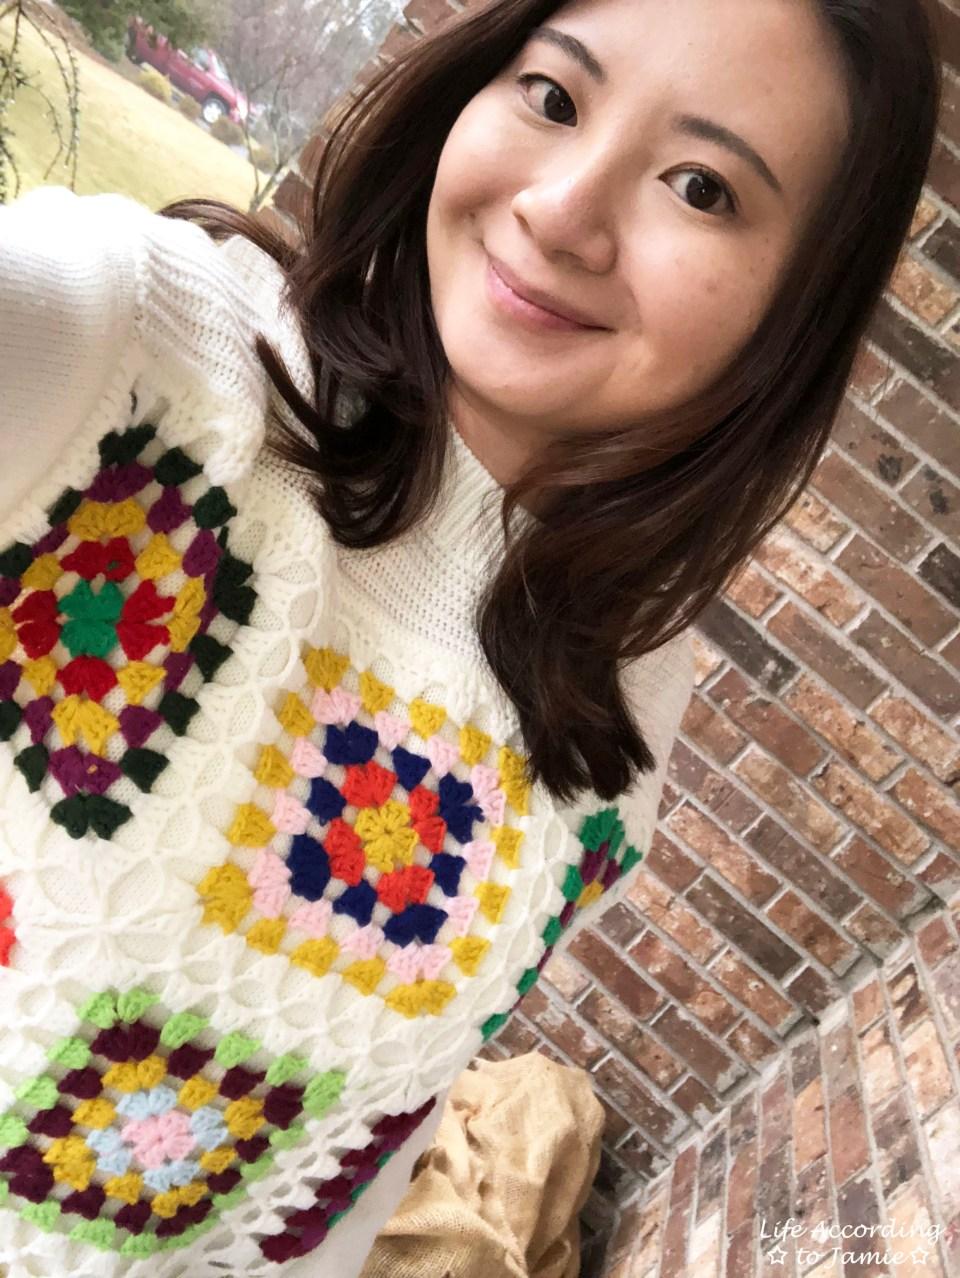 Boho Charm Crochet Knit Sweater 5